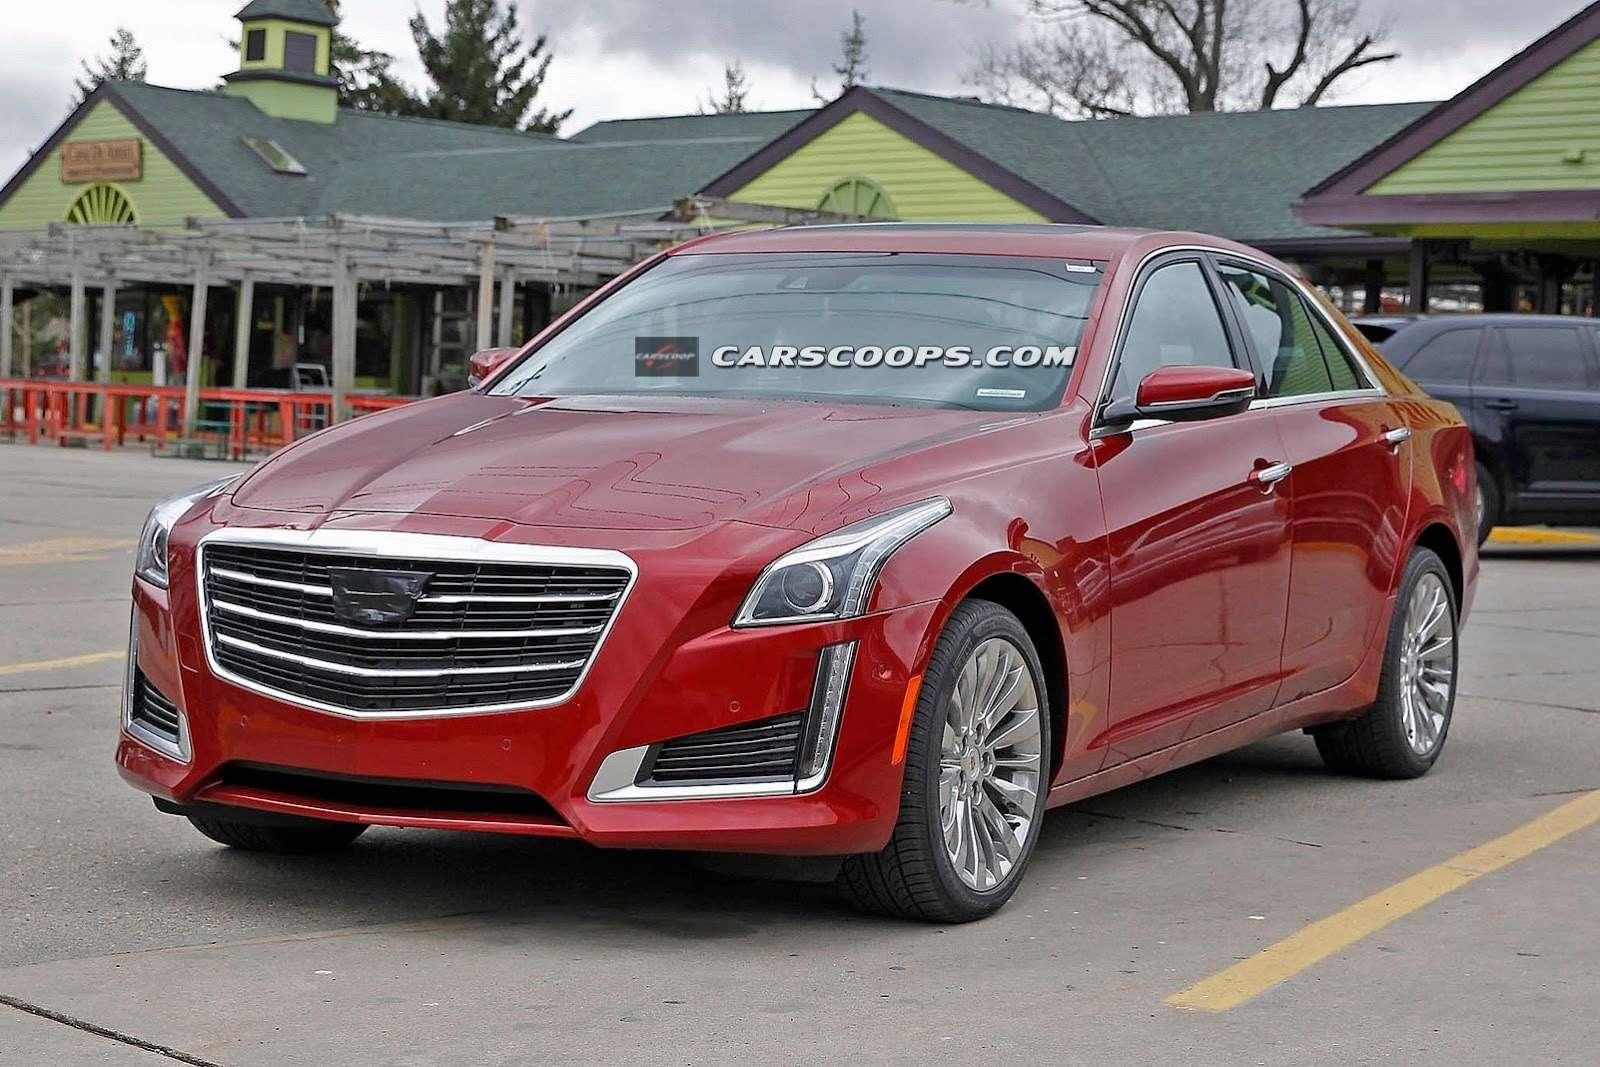 2015-Cadillac-CTS-Sedan-5[4]